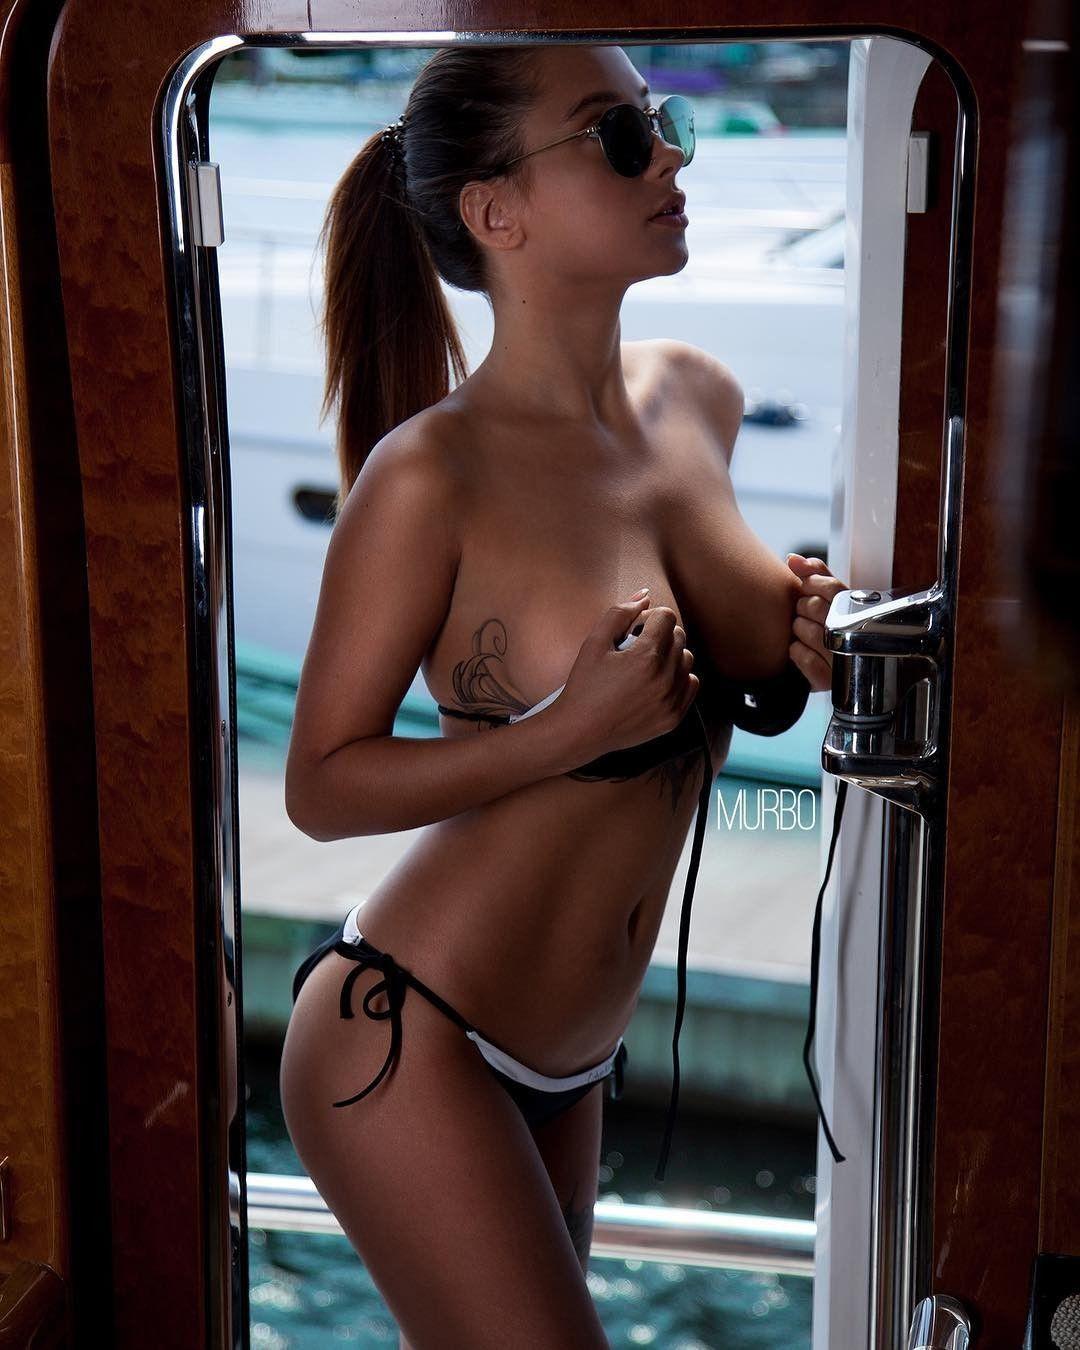 Sexy Kristina Shcherbinina nudes (88 photo), Ass, Fappening, Instagram, cameltoe 2006